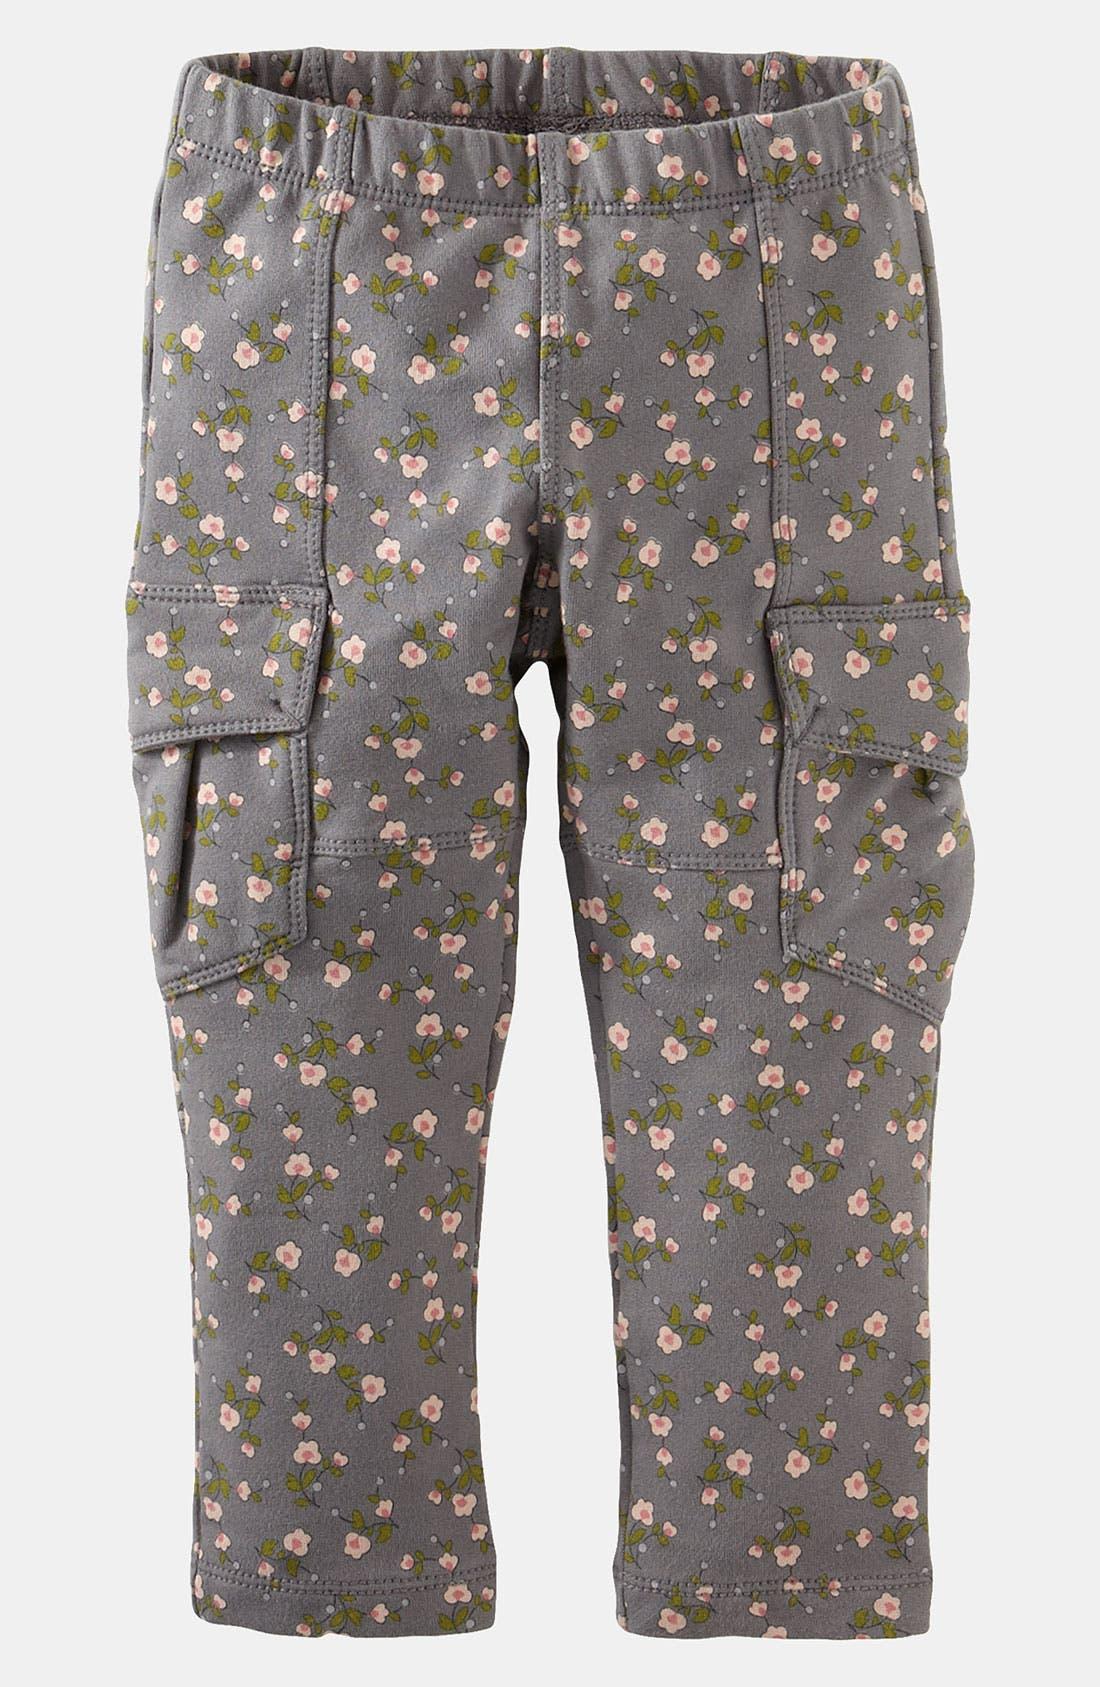 Alternate Image 1 Selected - Tea Collection Cargo Pants (Little Girls & Big Girls)